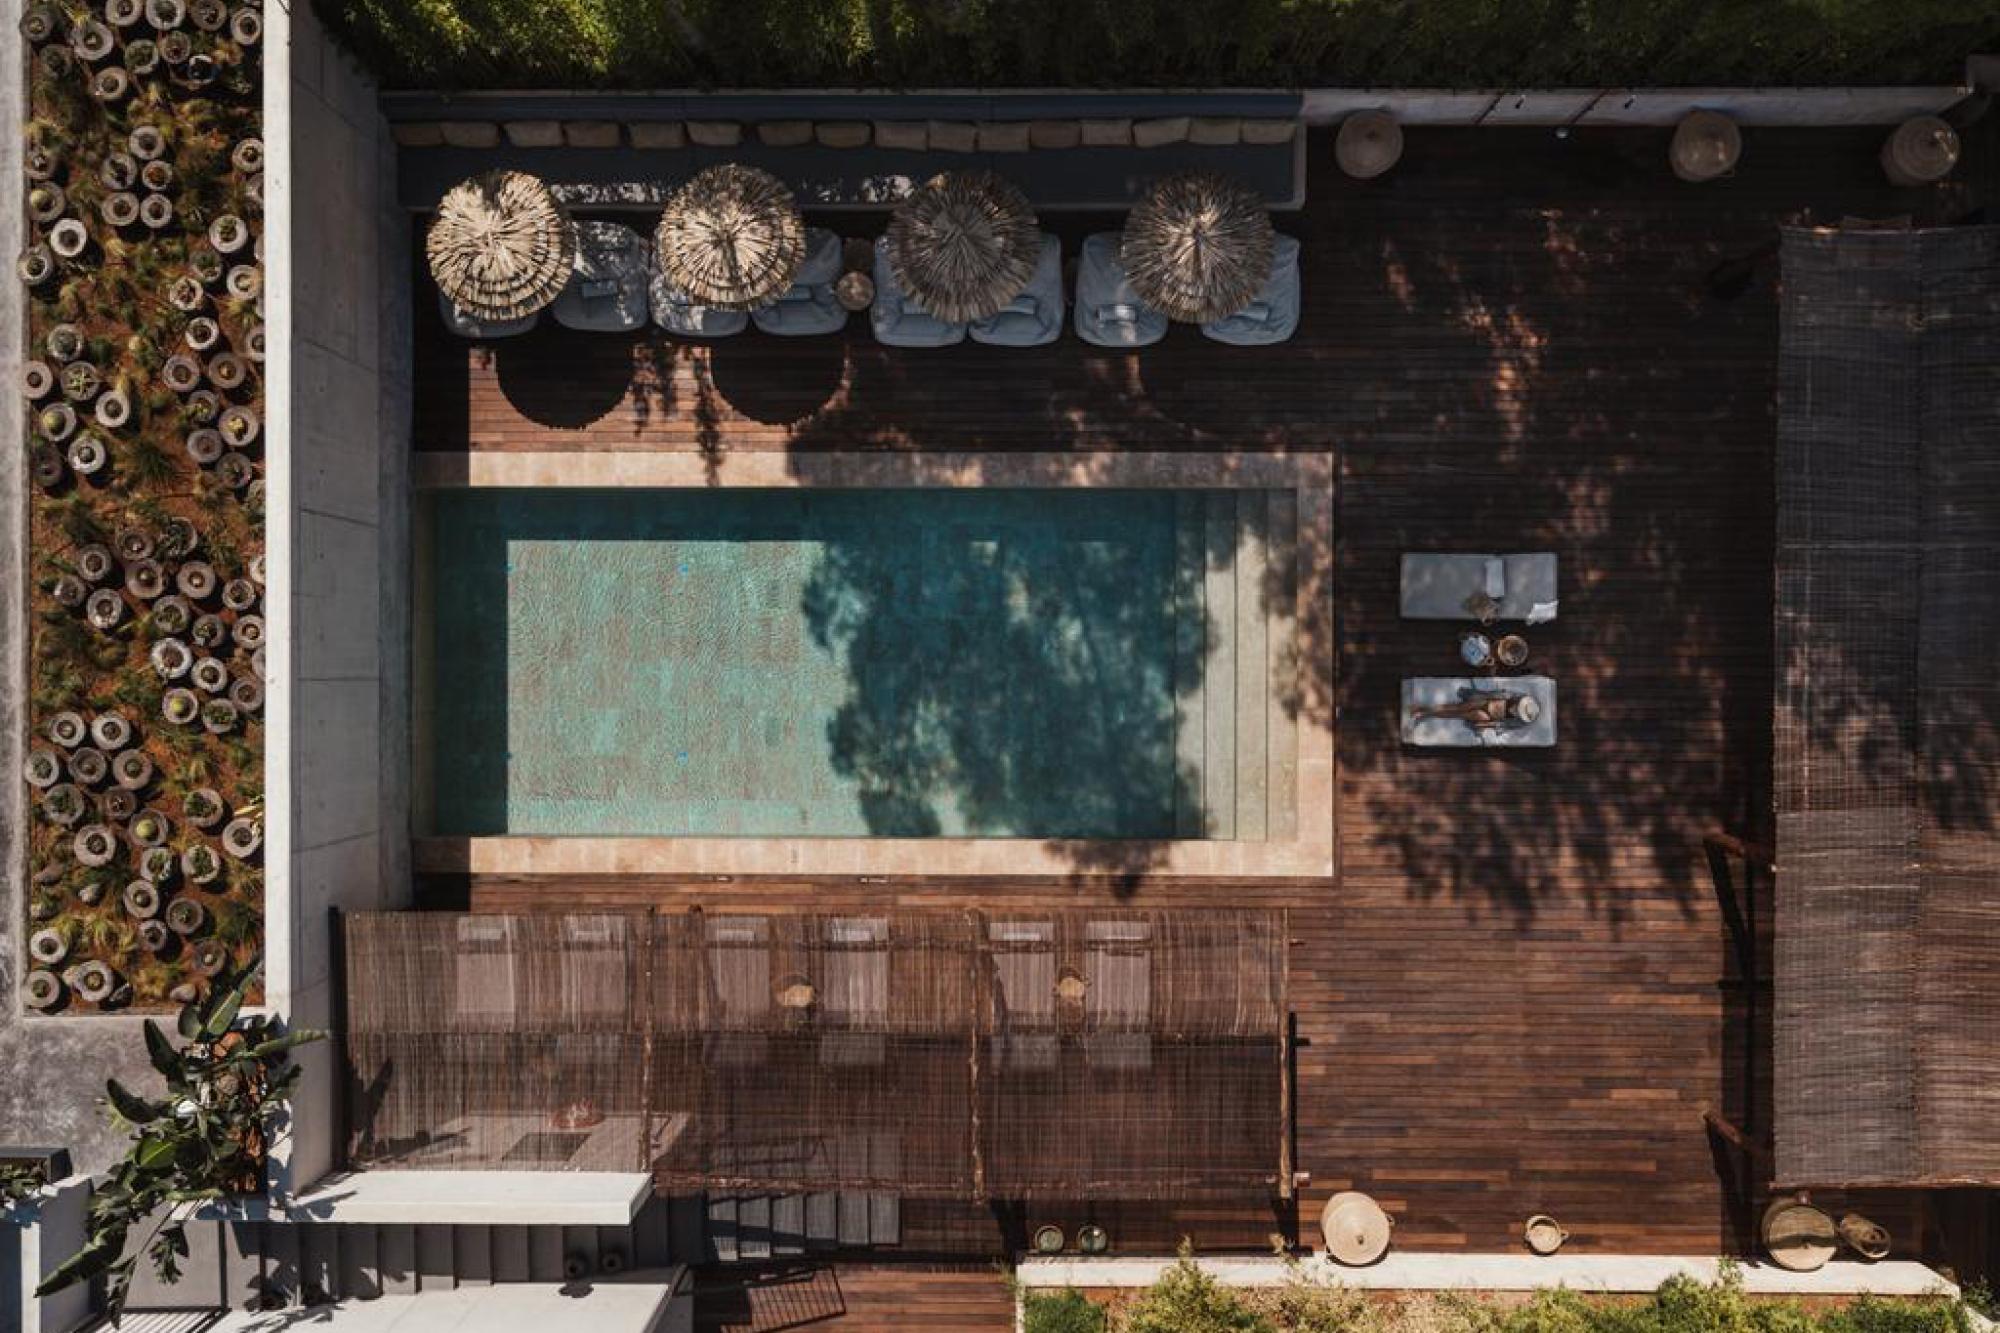 OKU Ibiza, the location of the Sah D'Simone retreat in July